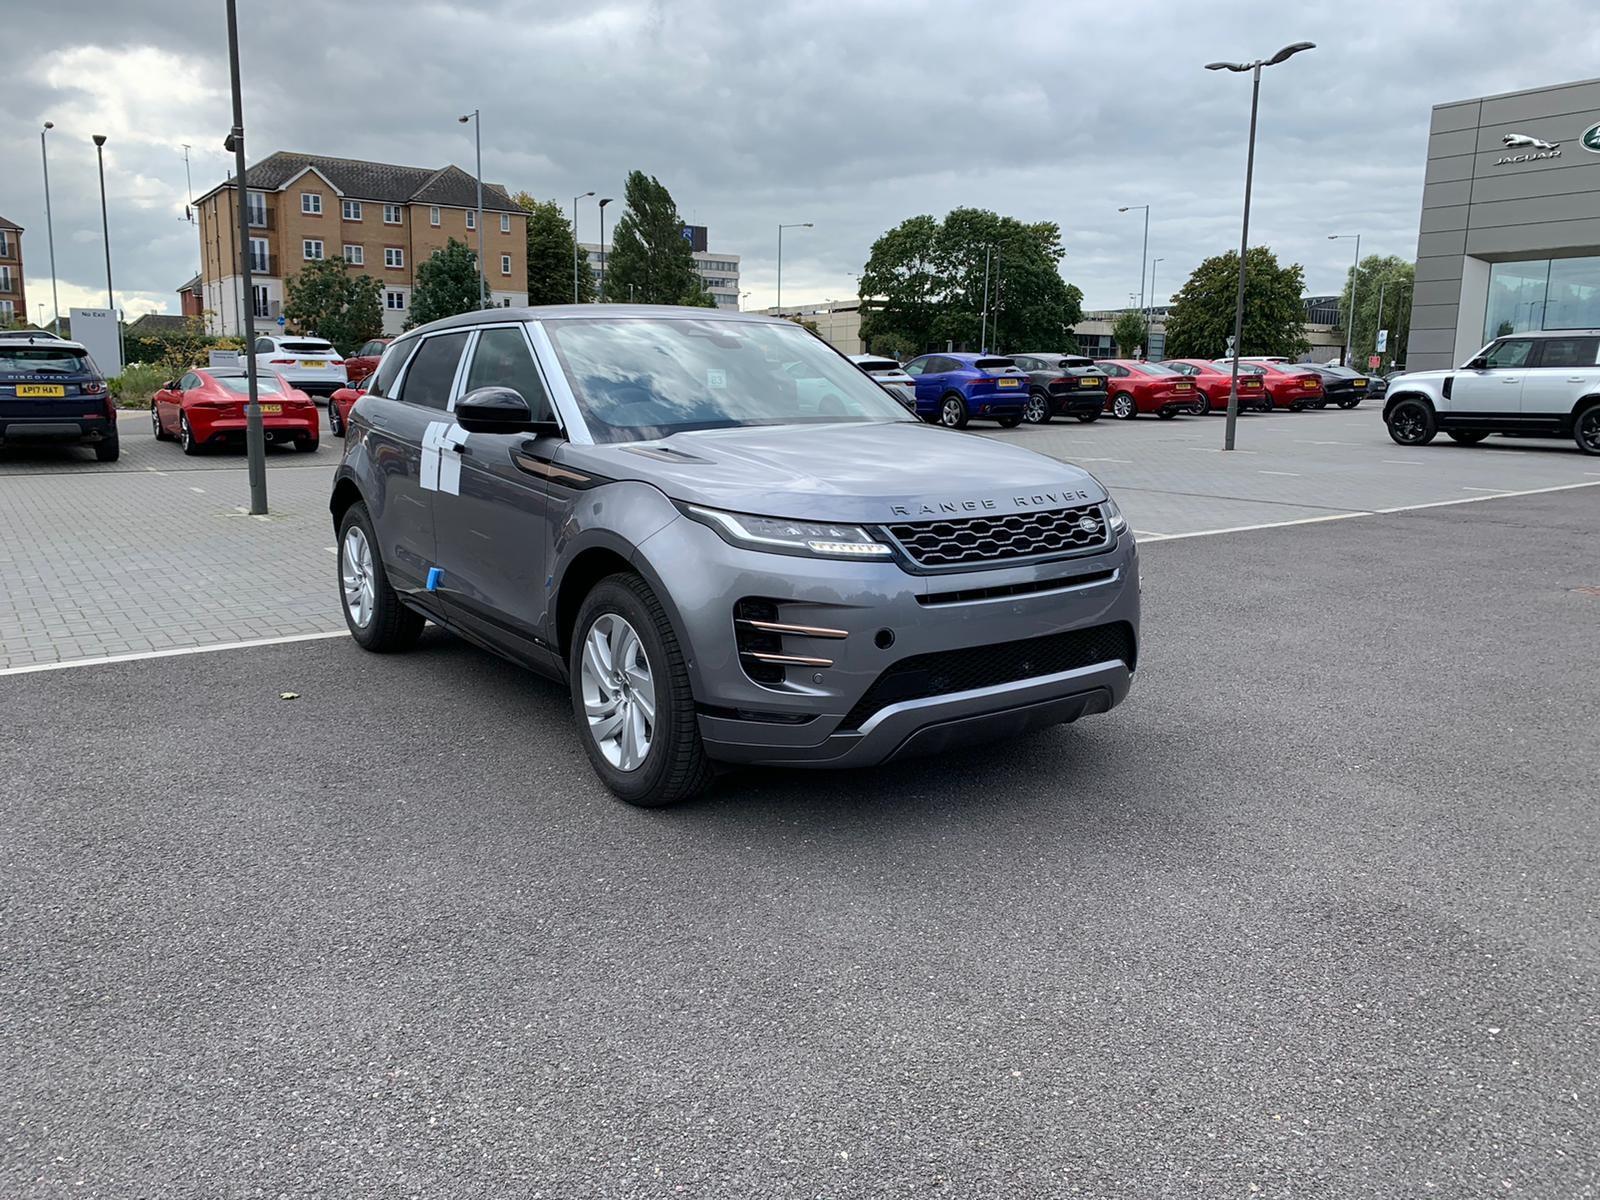 Land Rover New Range Rover Evoque AWD Auto R-Dynamic S image 1